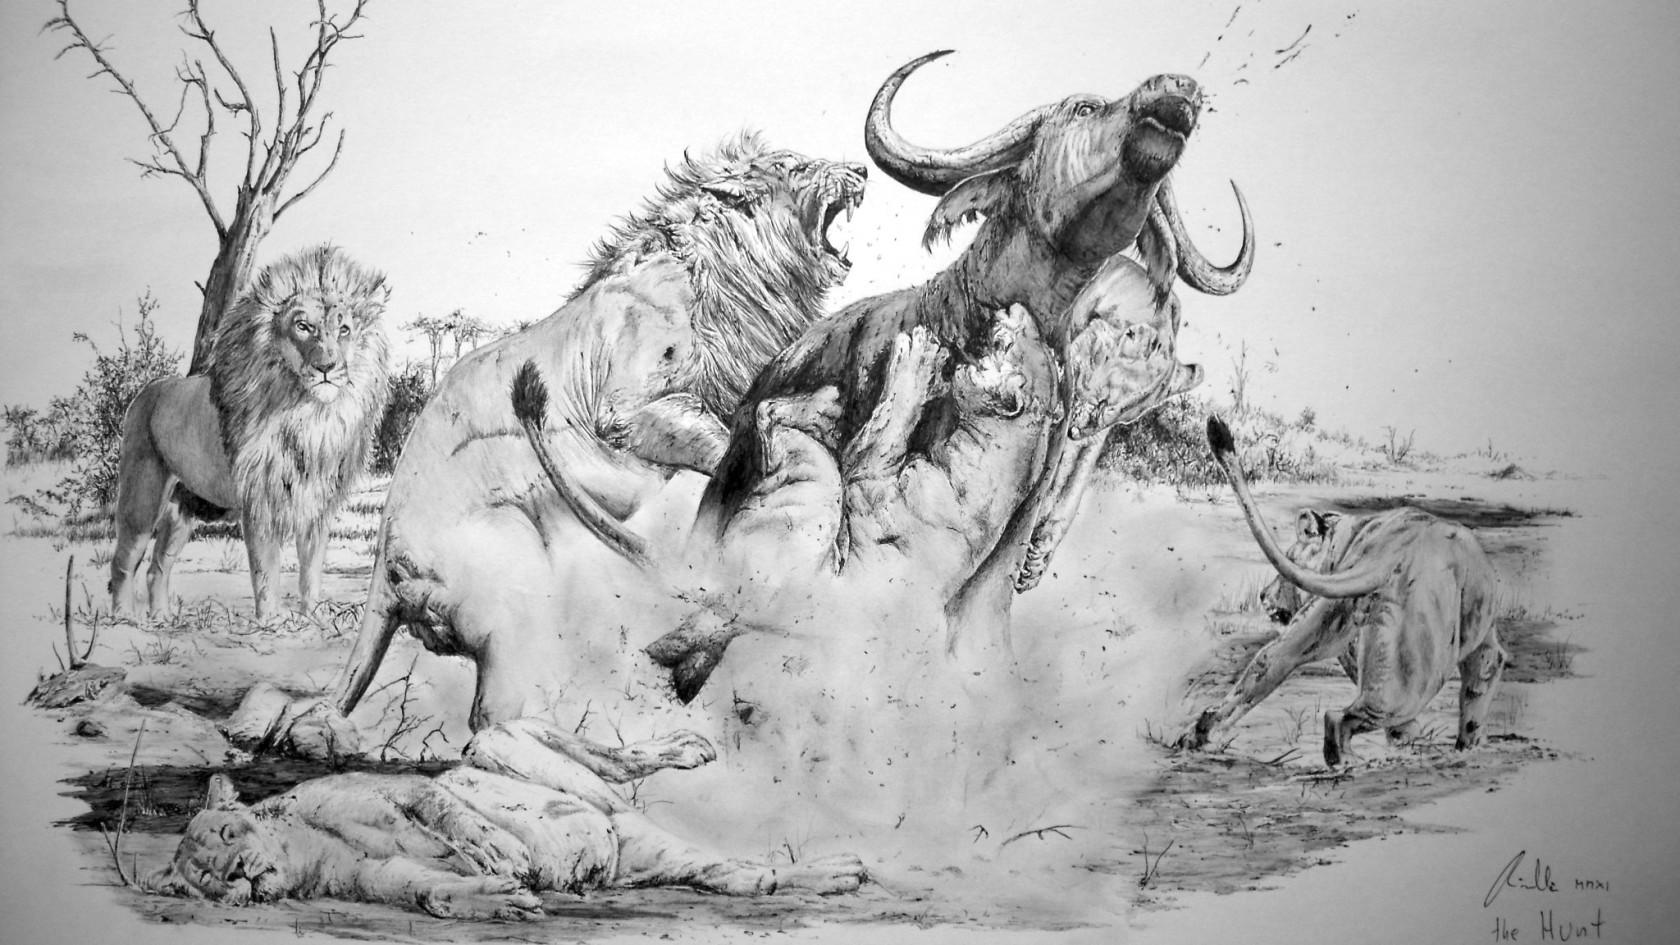 O Me Obrazy Ilustrace Knih Malba Na Zakazku Vladimir Rimbala